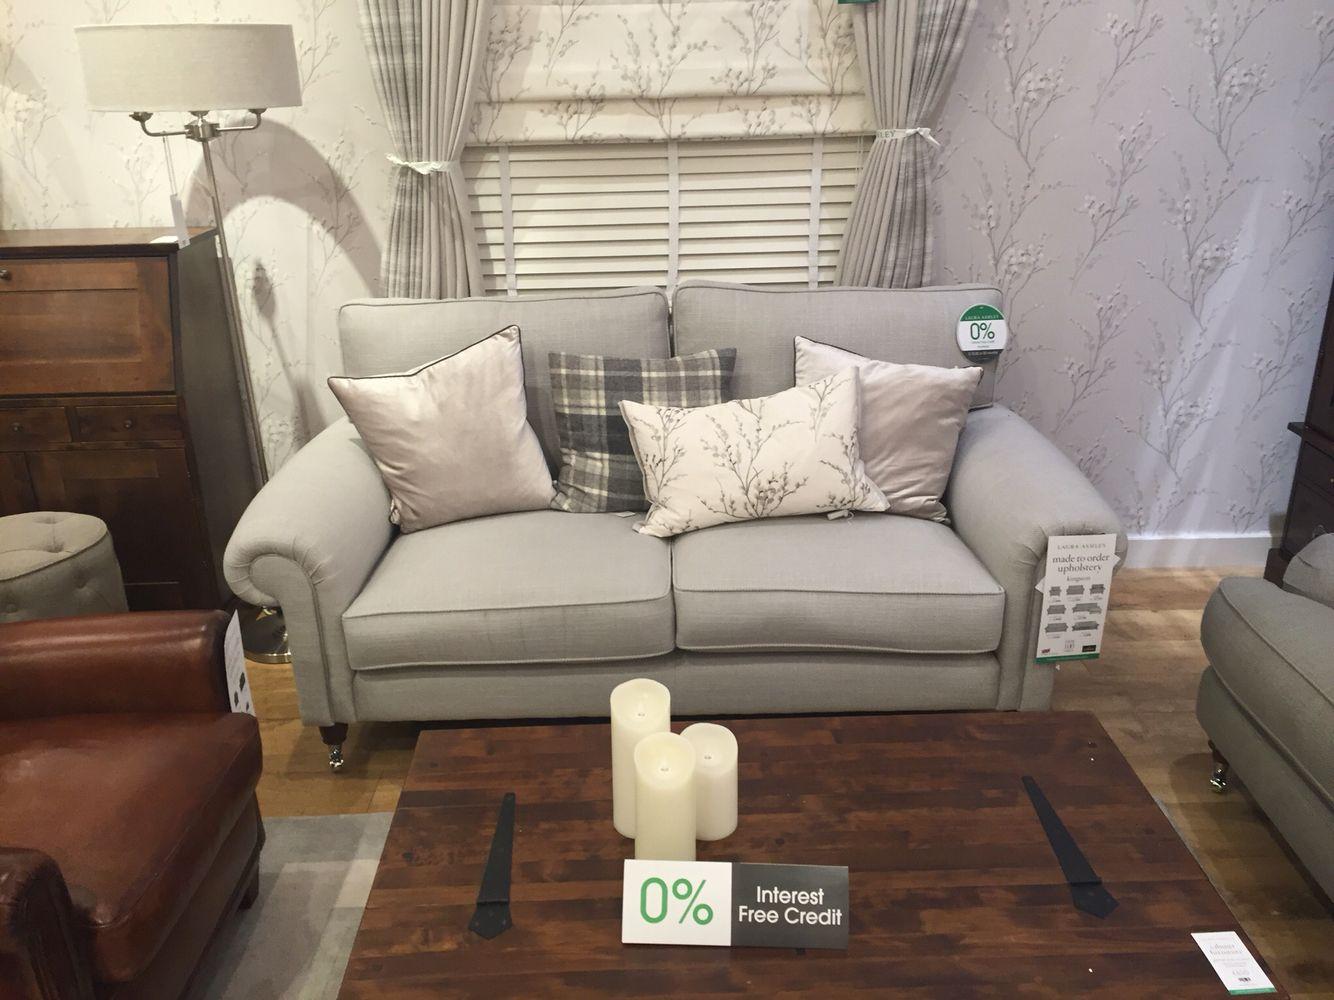 Laura Ashley Kingston Sofa Dove Grey GreyLaura AshleyRoom Ideas KingstonLiving RoomHouse DesignCurtainsSofas